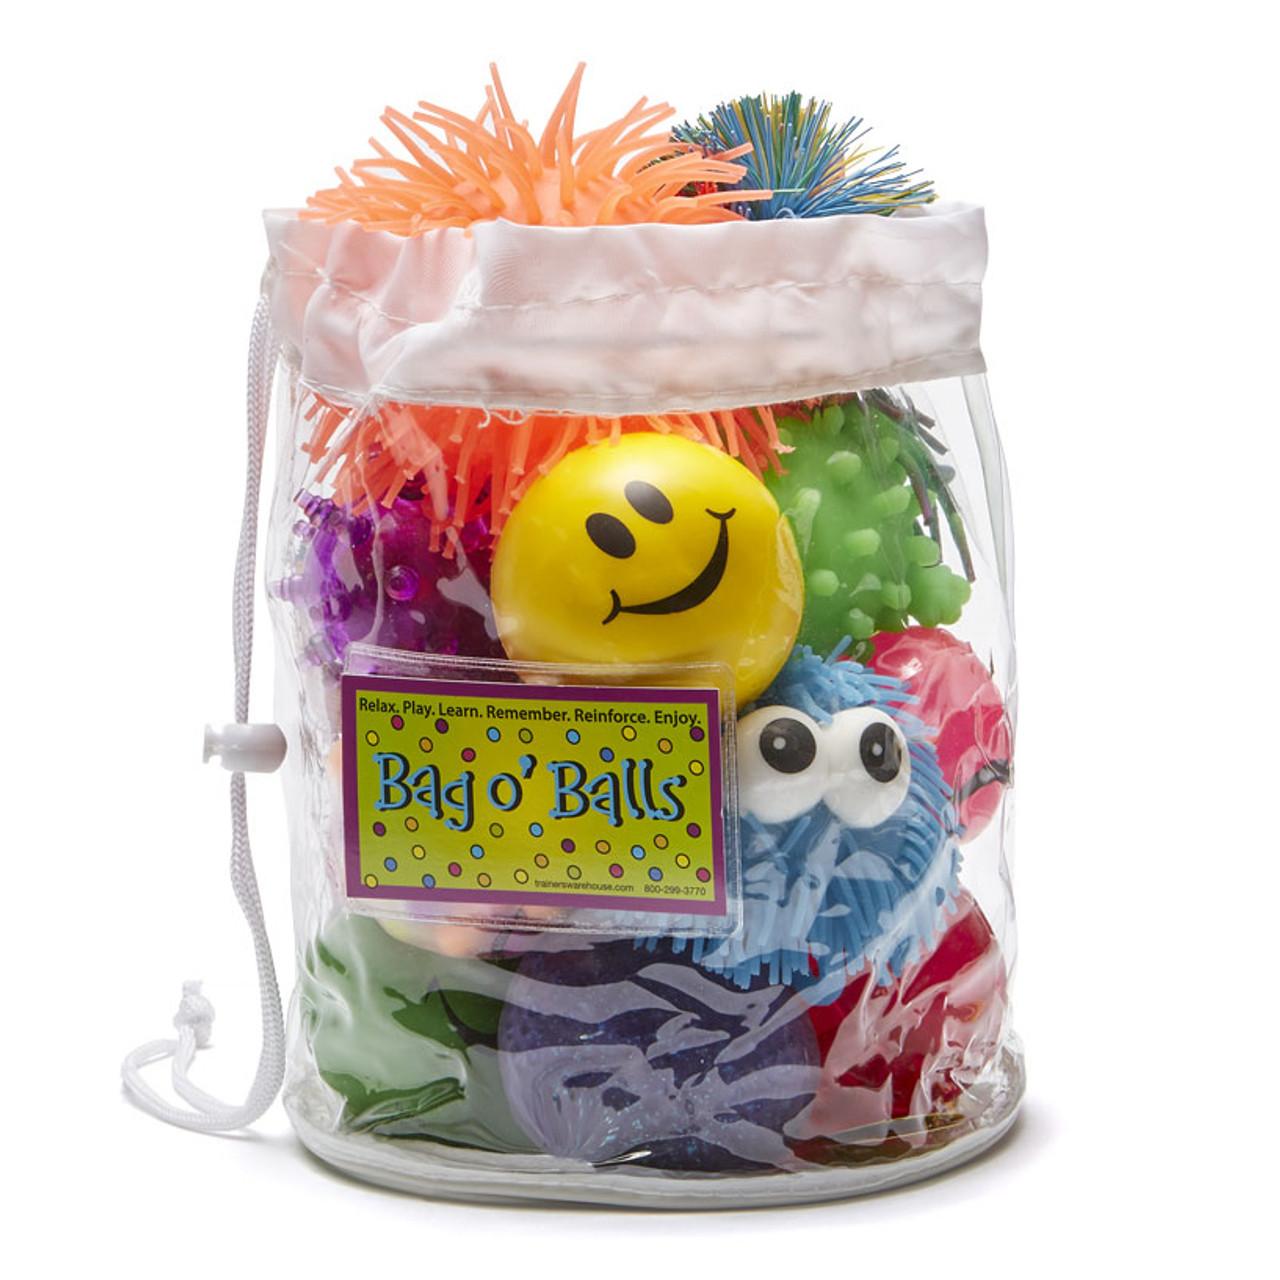 12 assorted balls in a clear vinyl, drawstring bag